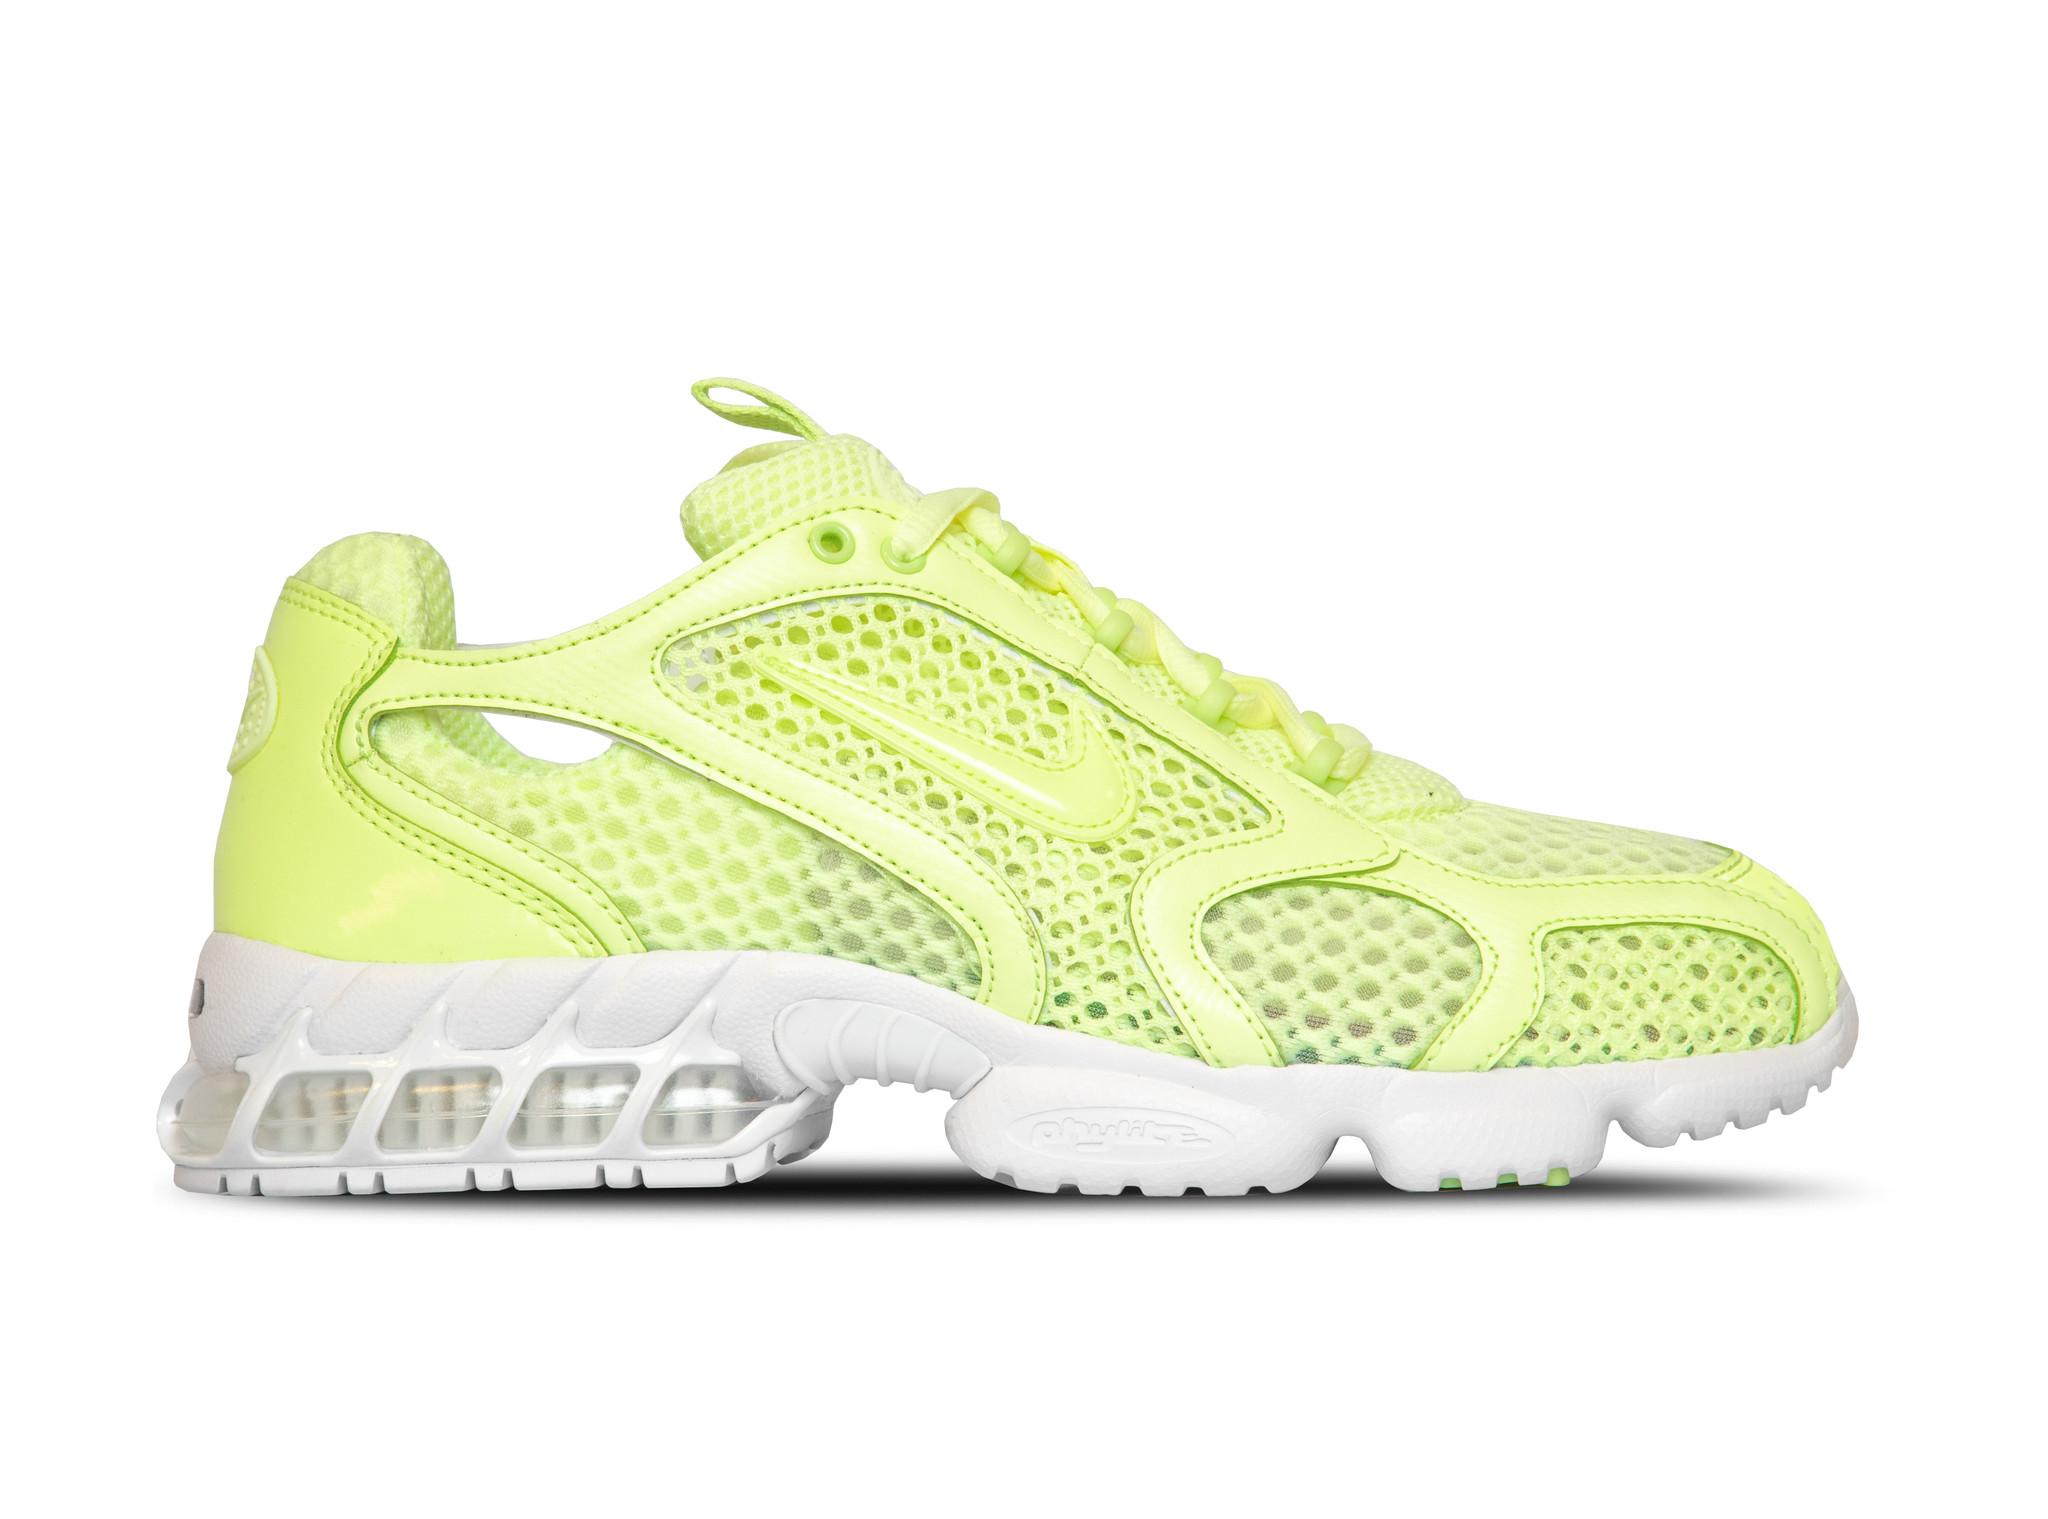 Nike Air Zoom Spiridon Cage 2 Barely